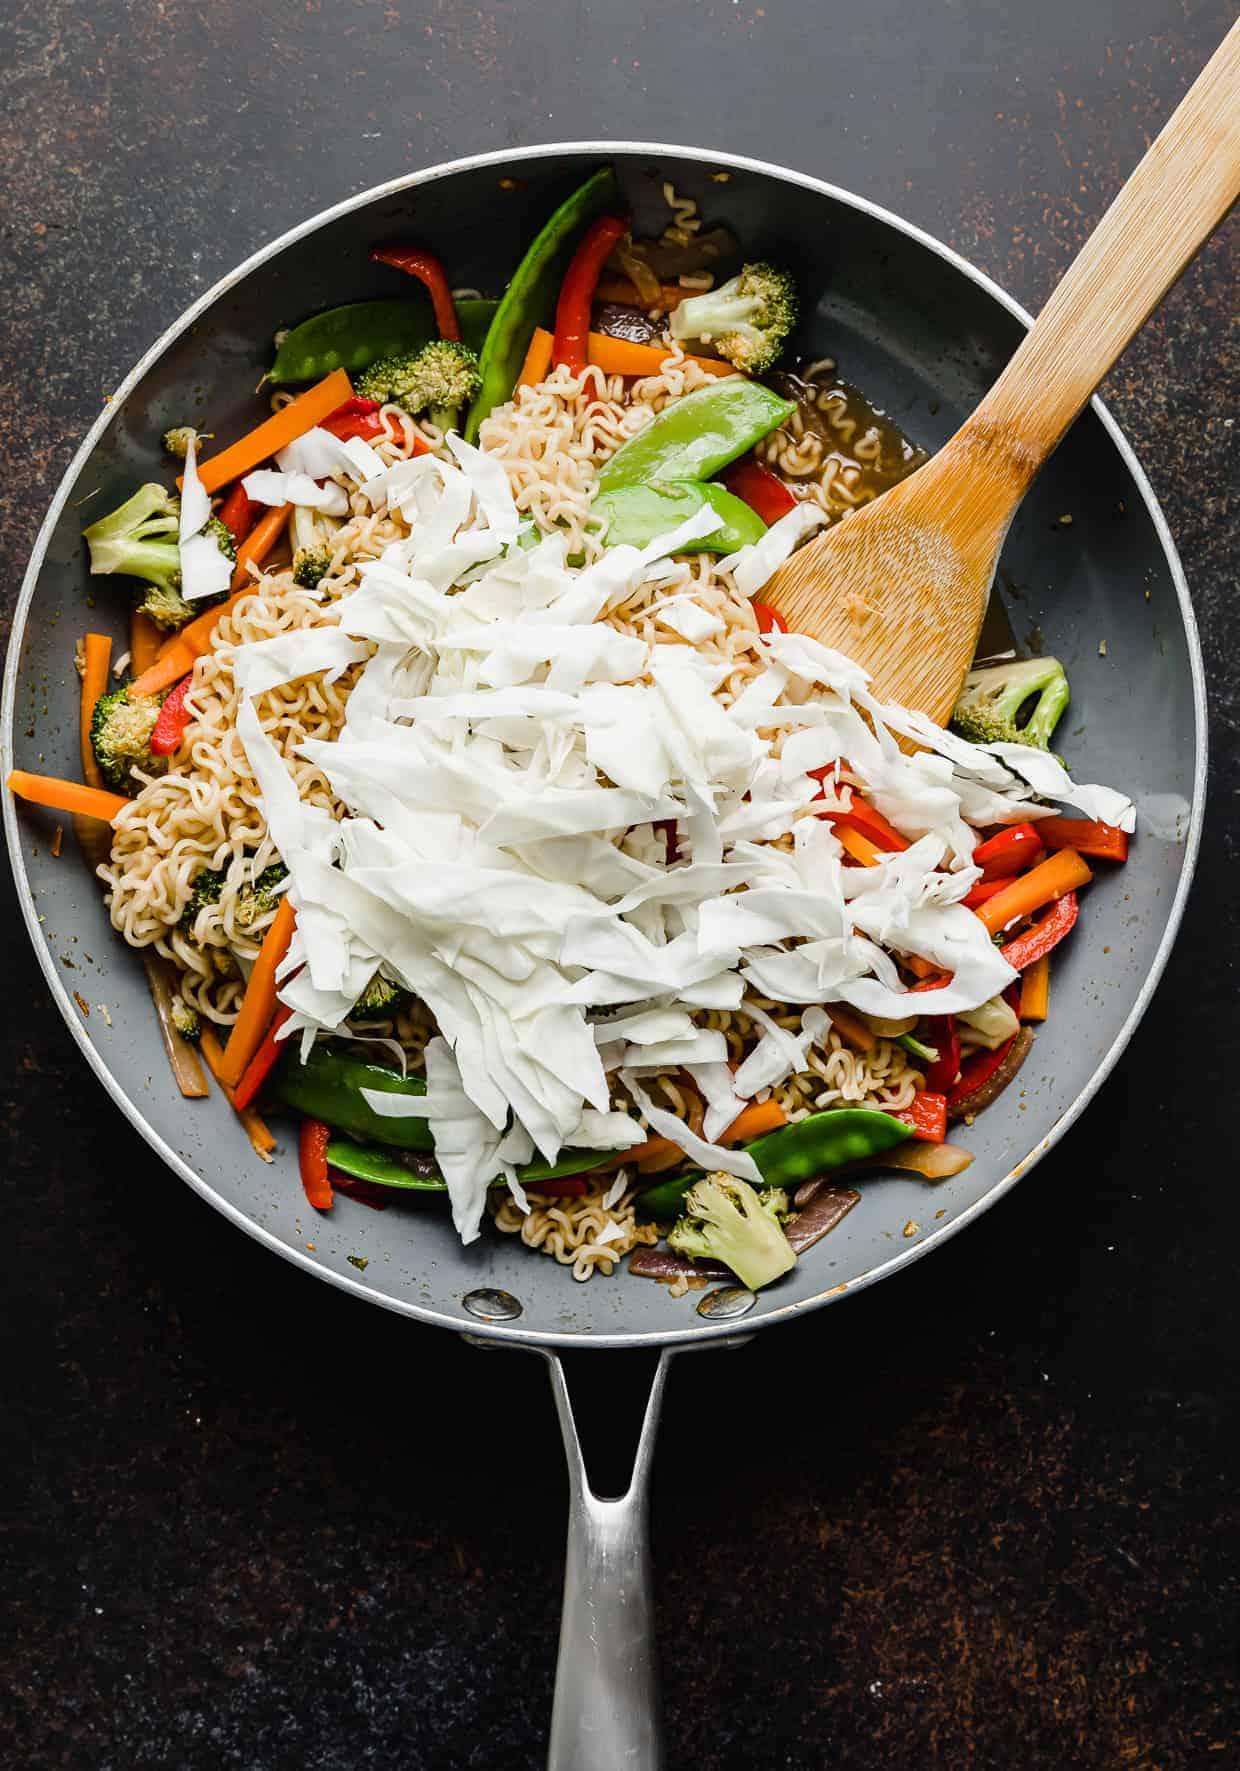 Sliced cabbage overtop Ramen with Vegetables.